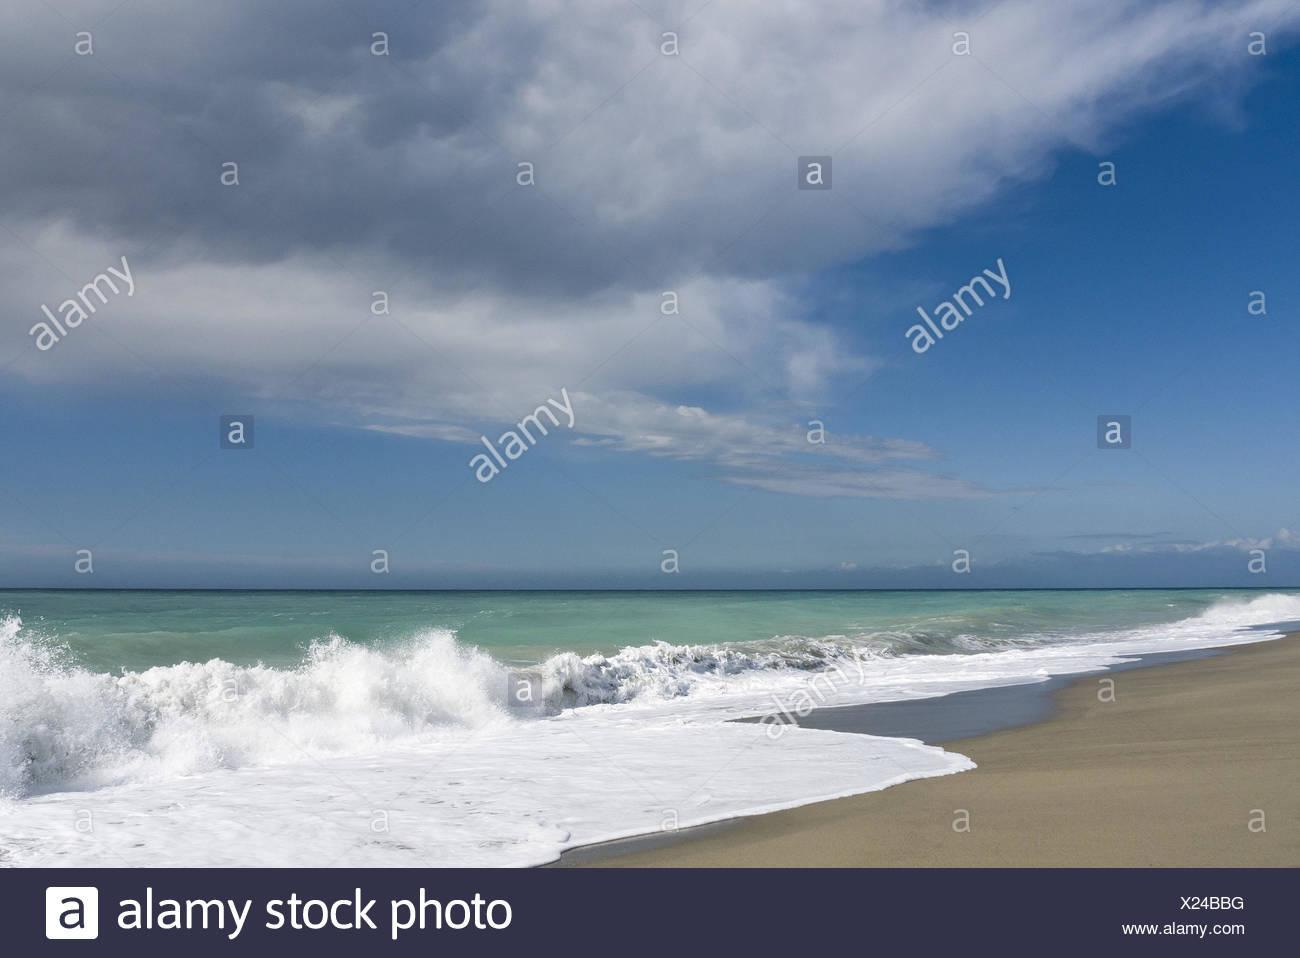 Italy, Liguria, Finale Ligure, - Stock Image